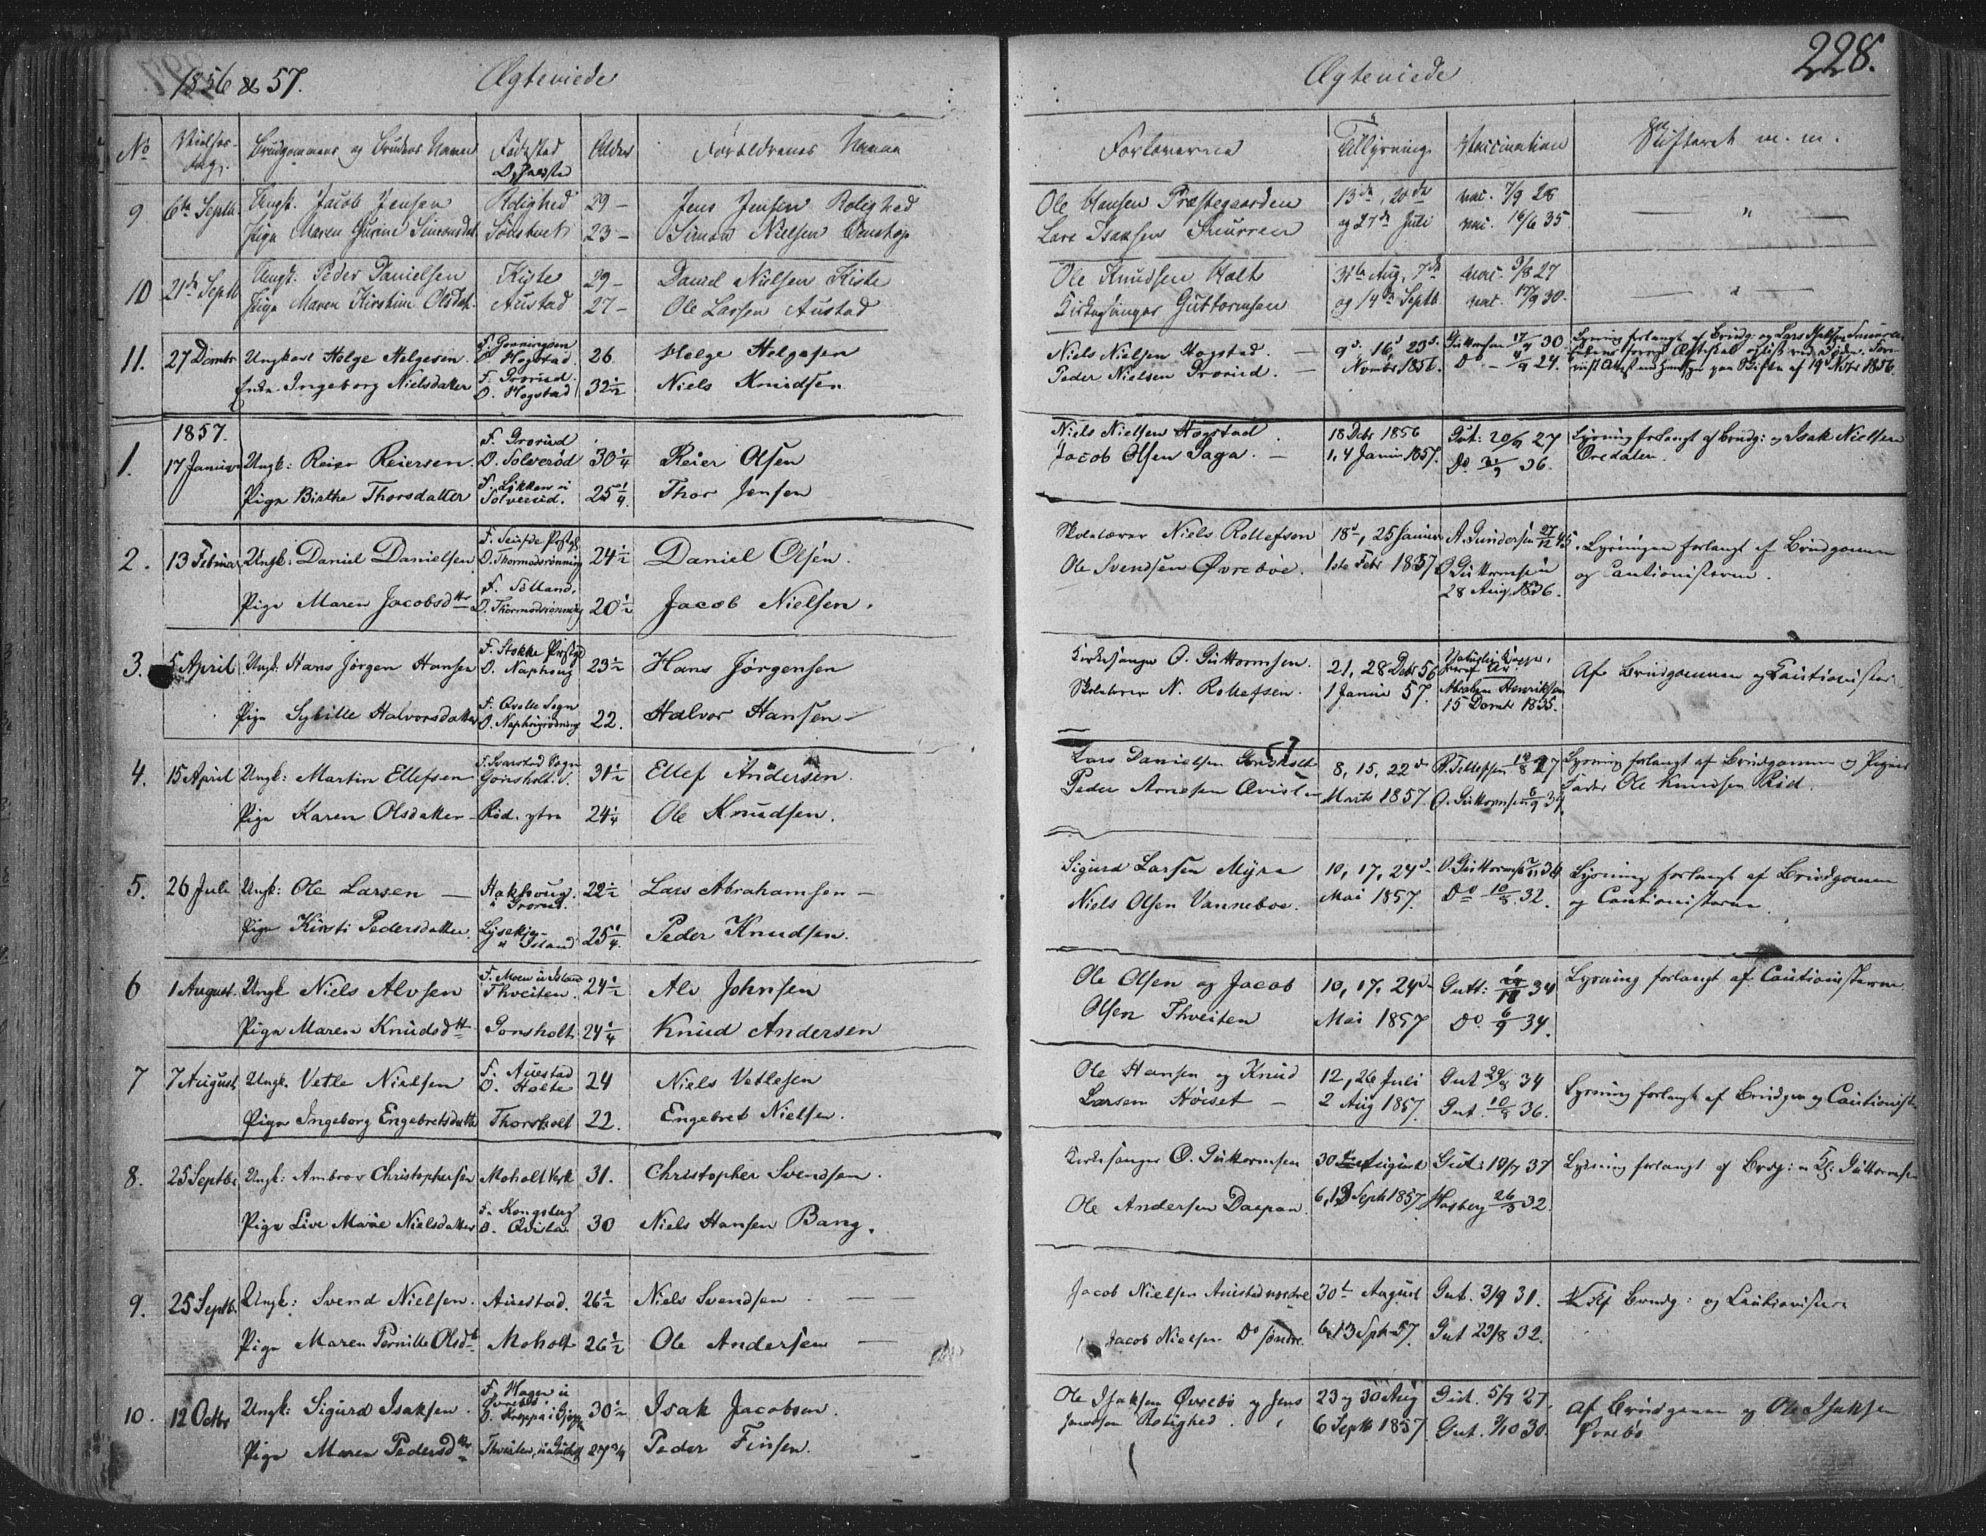 SAKO, Siljan kirkebøker, F/Fa/L0001: Parish register (official) no. 1, 1831-1870, p. 228